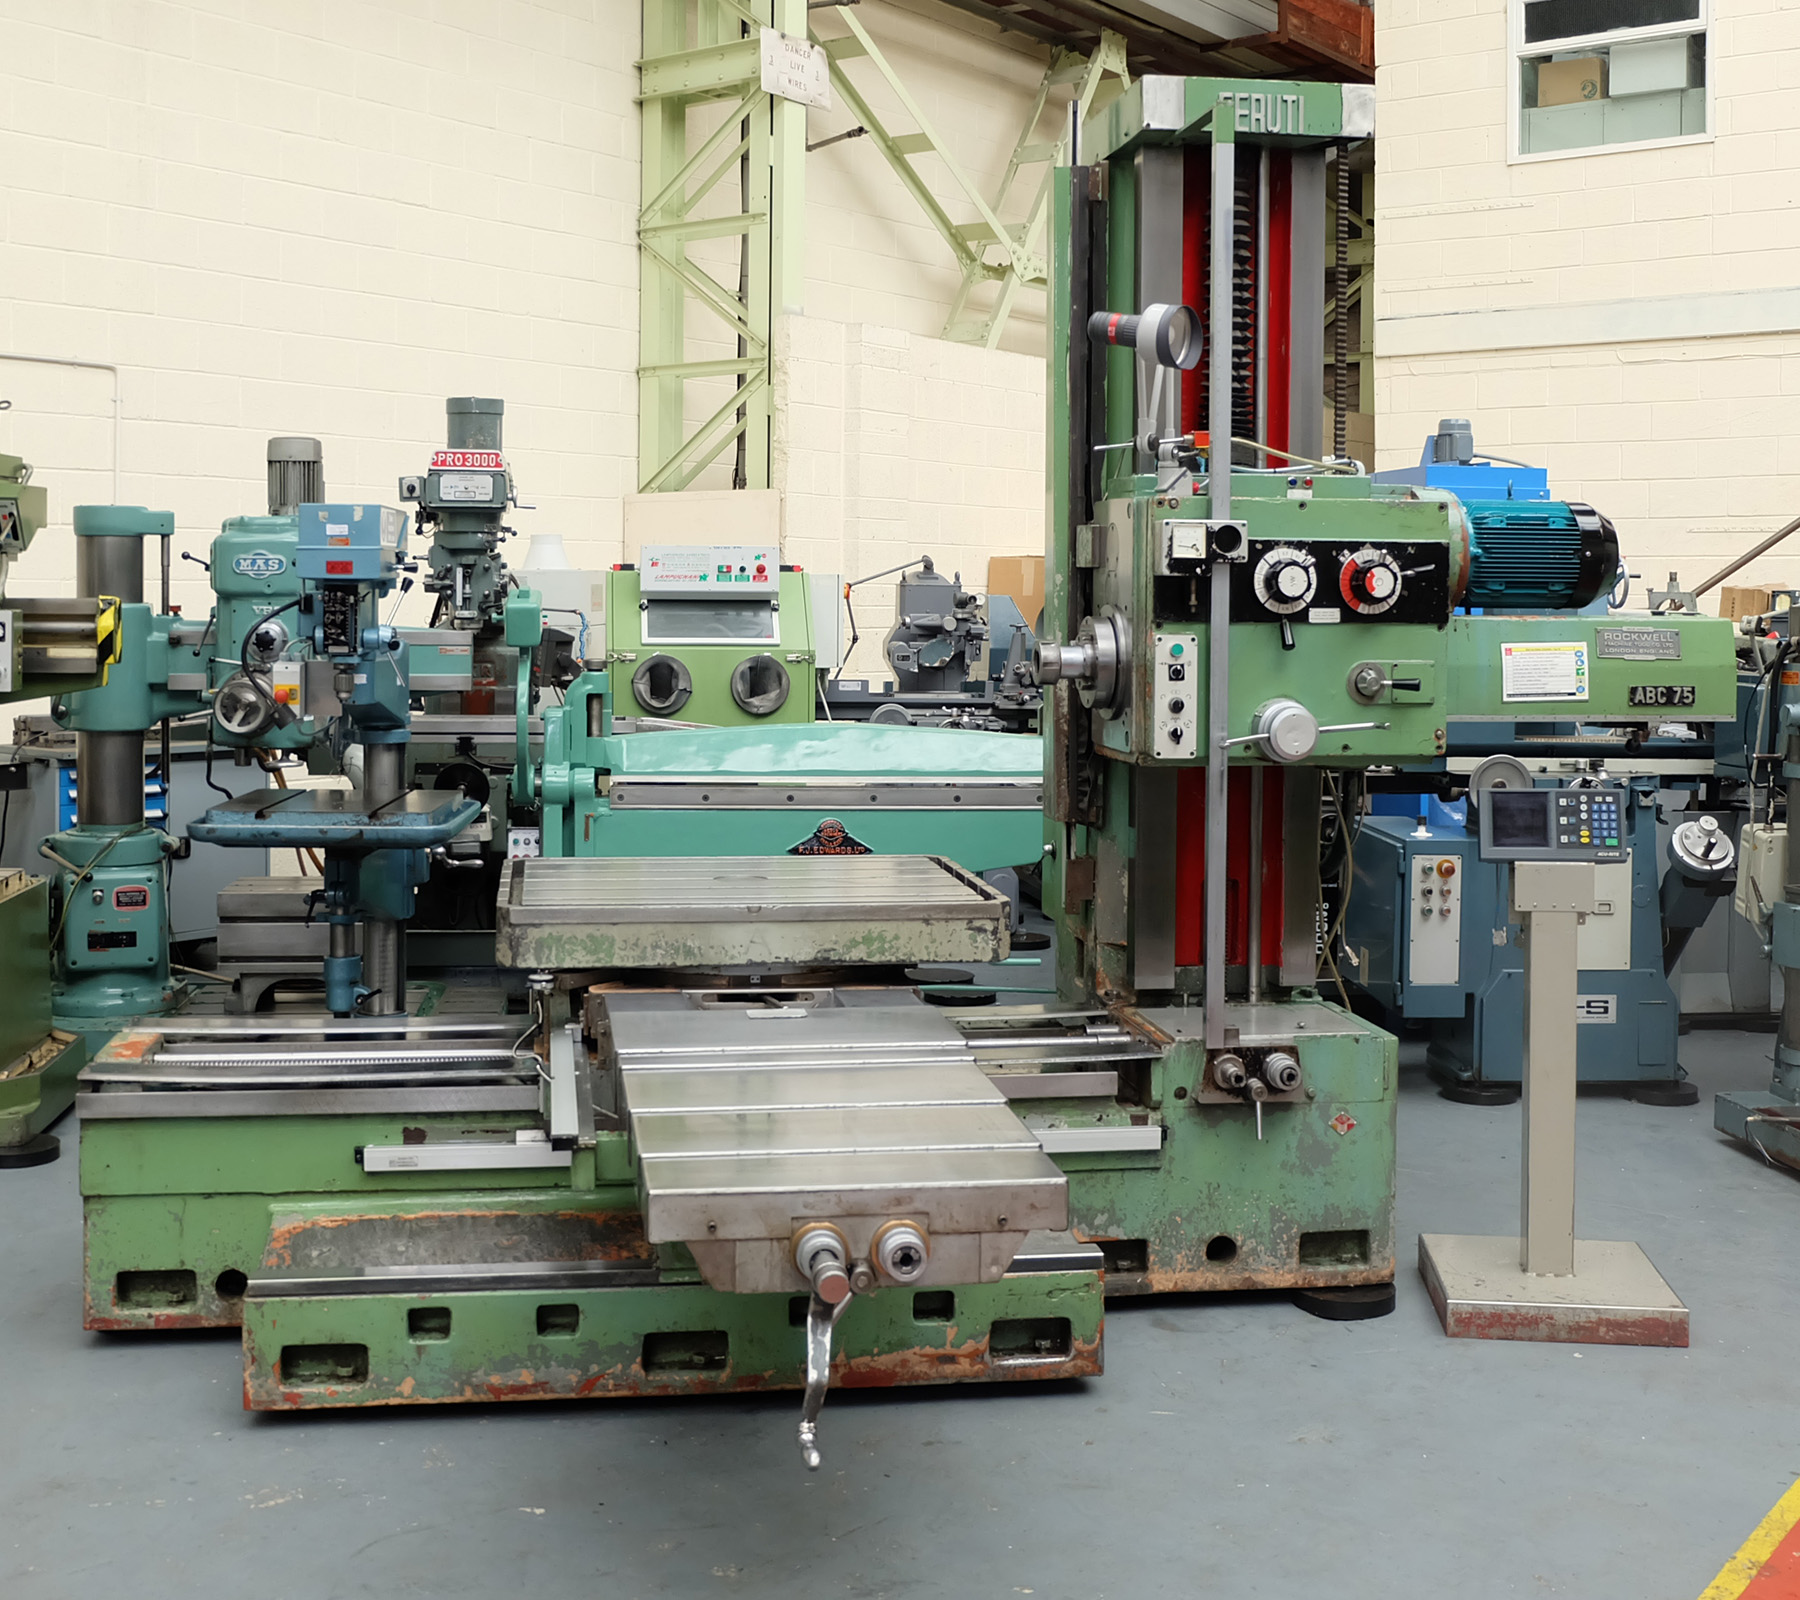 Ceruti Model ABC 75 Horizontal Boring & Milling Machine. With Tooling.